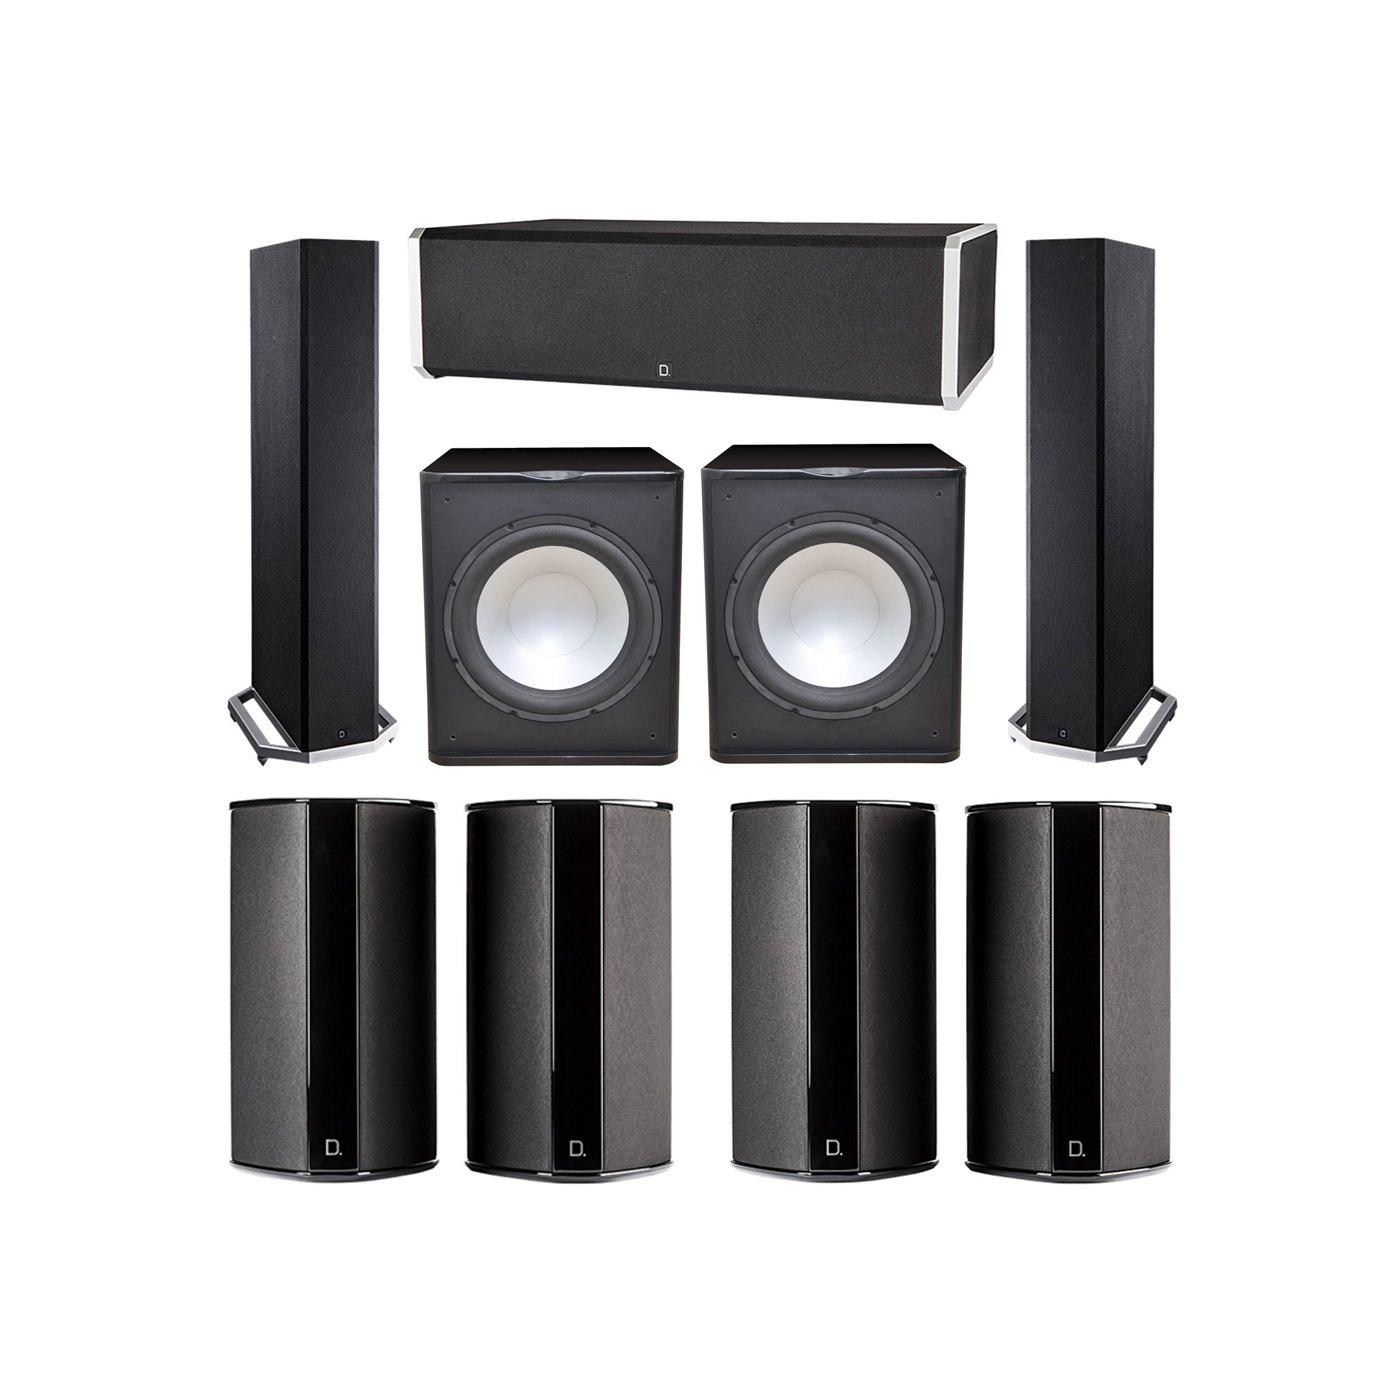 Definitive Technology 7.2 System with 2 BP9020 Tower Speakers, 1 CS9060 Center Channel Speaker, 4 SR9080 Surround Speaker, 2 Premier Acoustic PA-150 Subwoofer